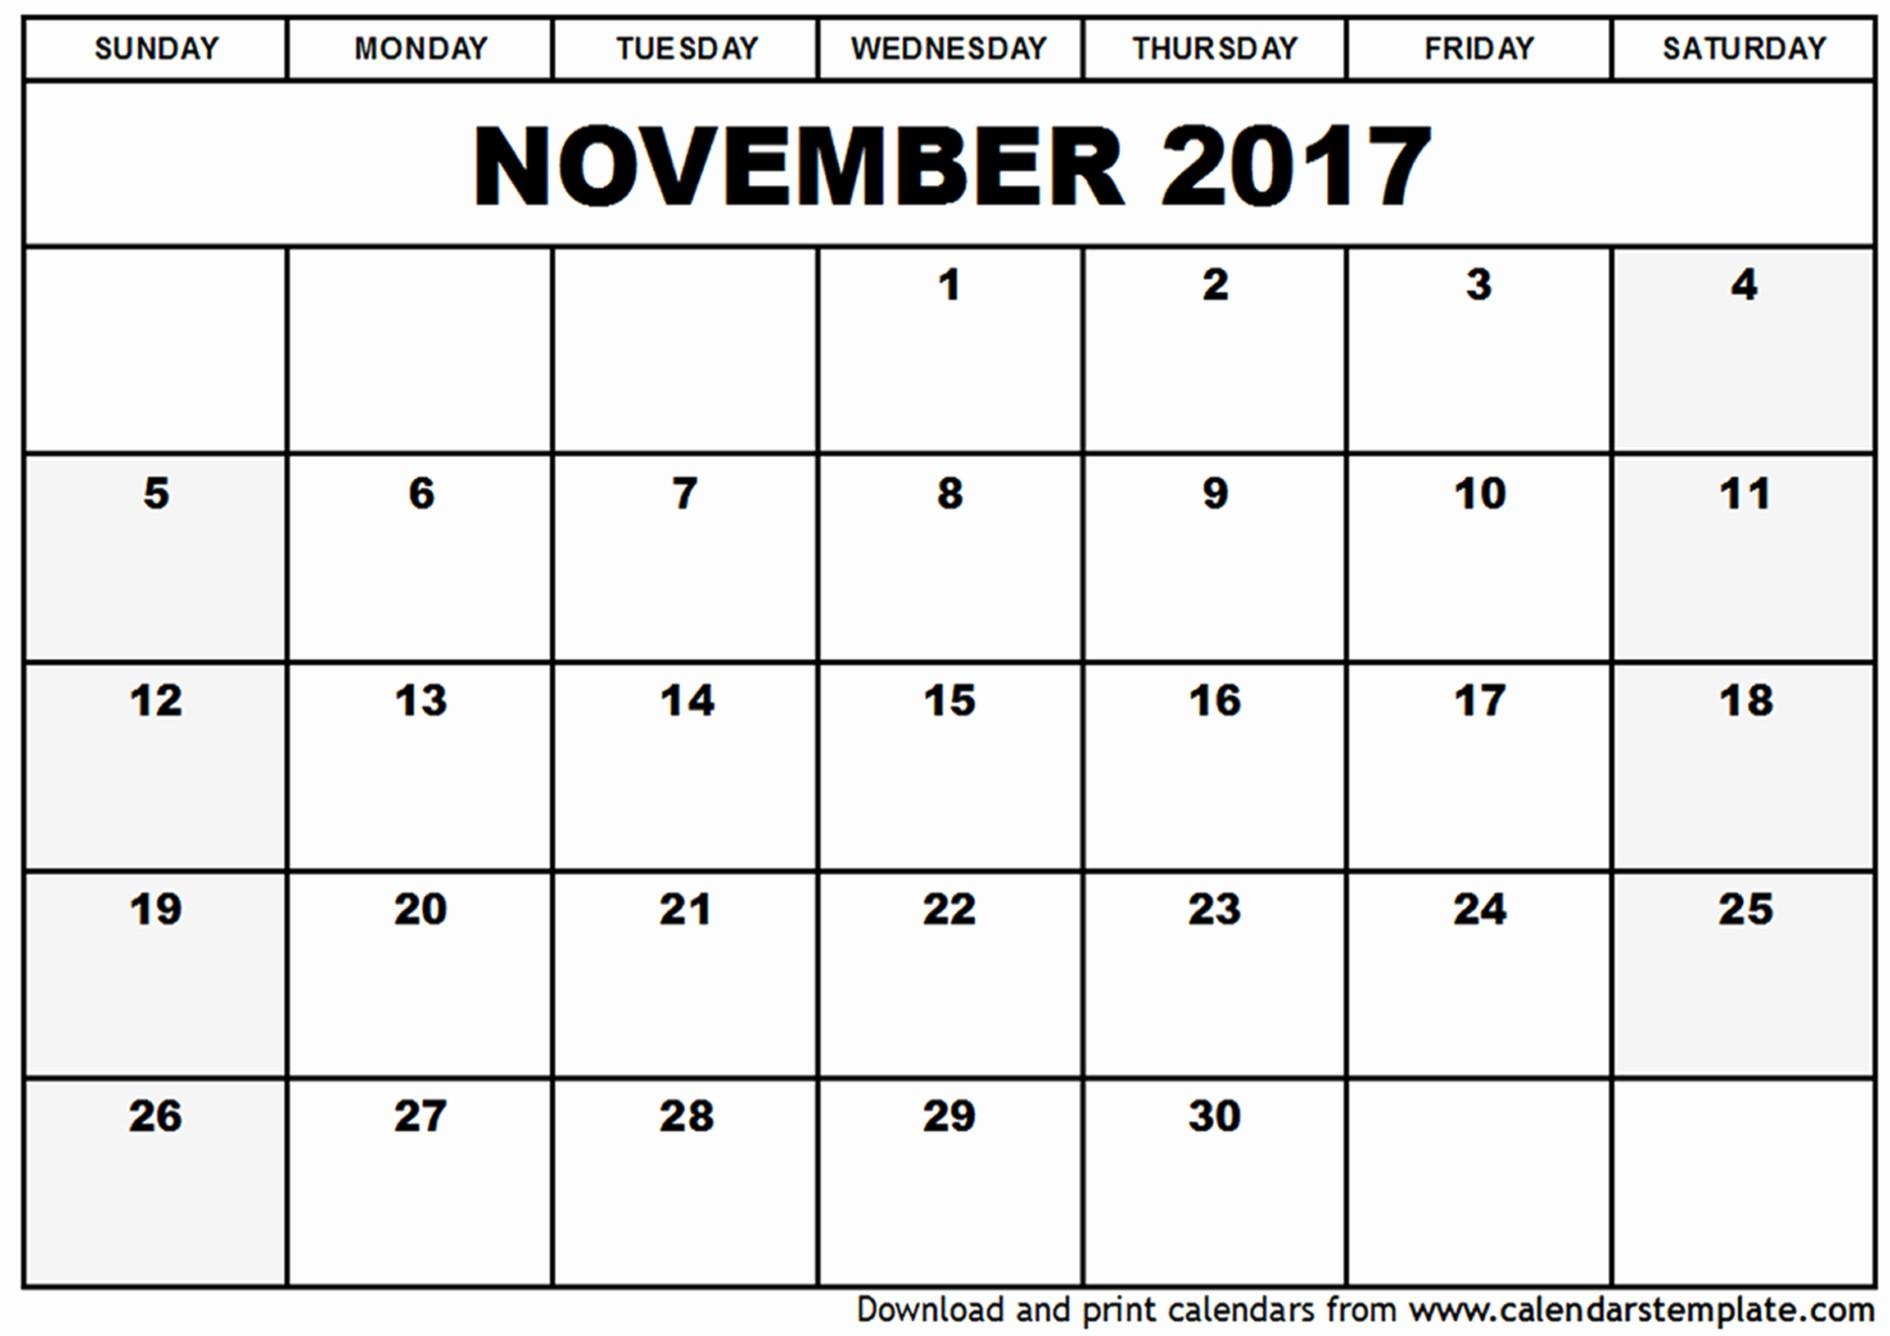 Blank November 2017 Calendar Template Luxury Blank November 2017 Calendar